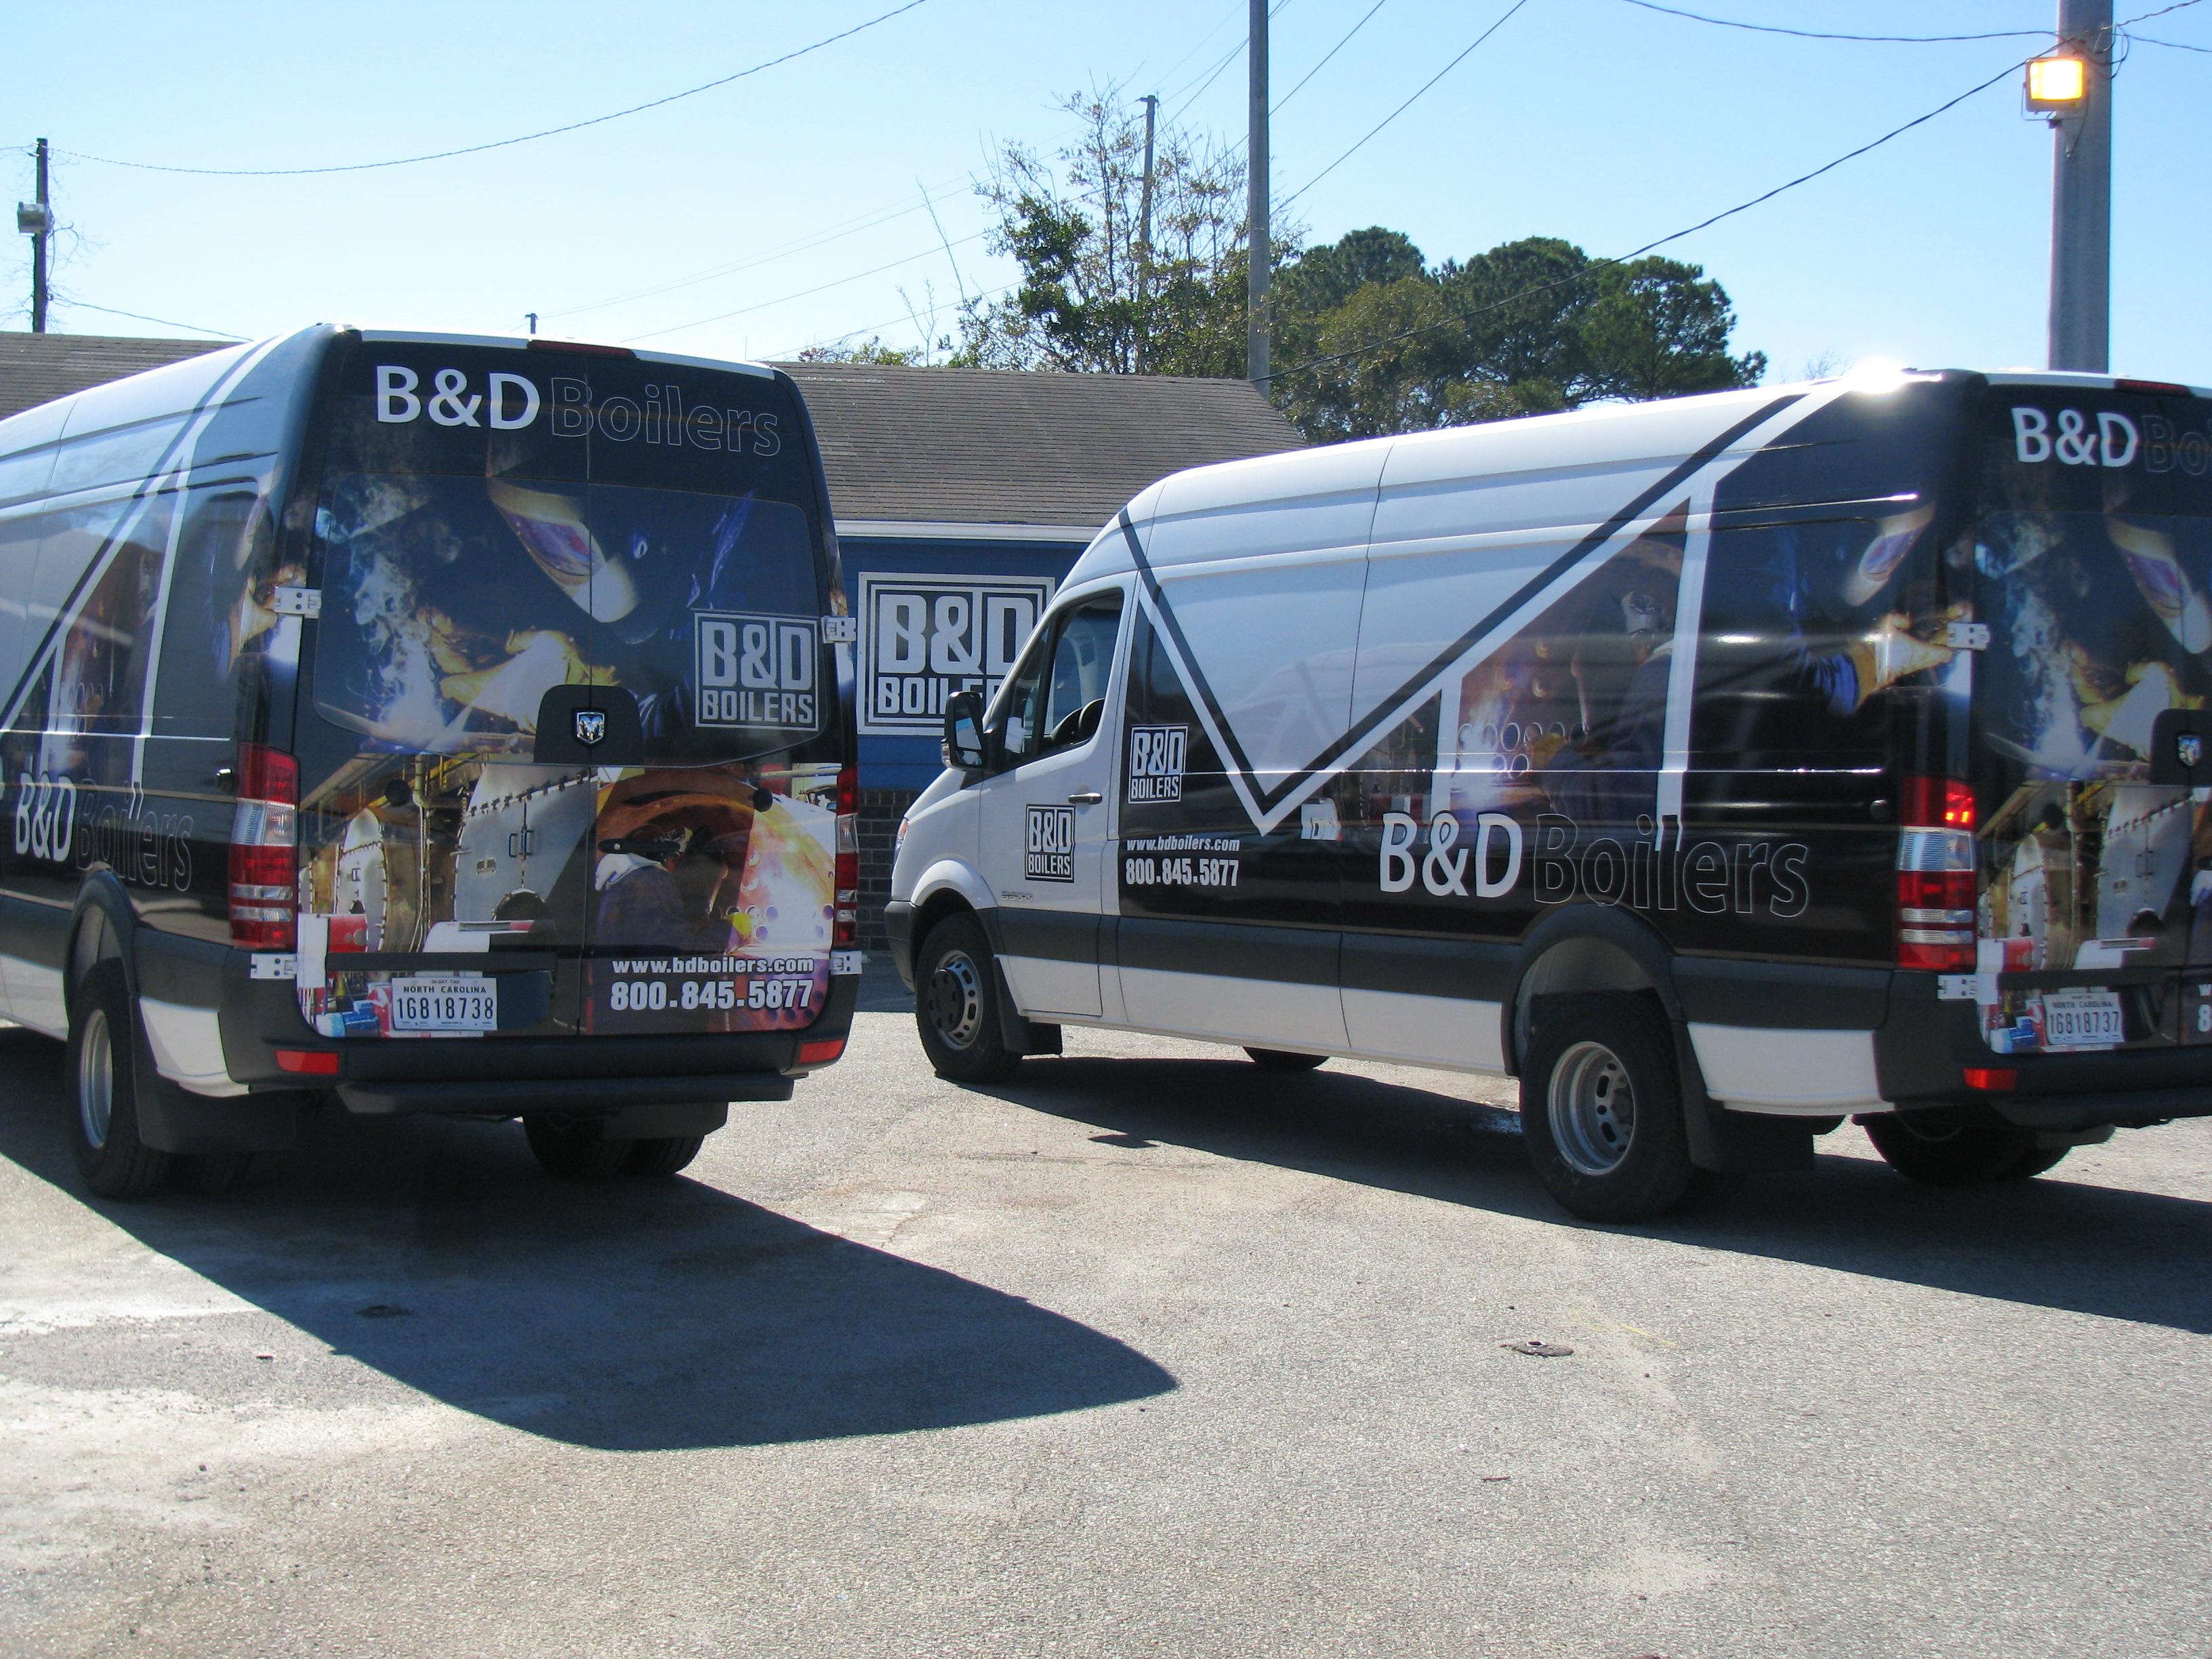 B&D Boilers Sprinter Vans